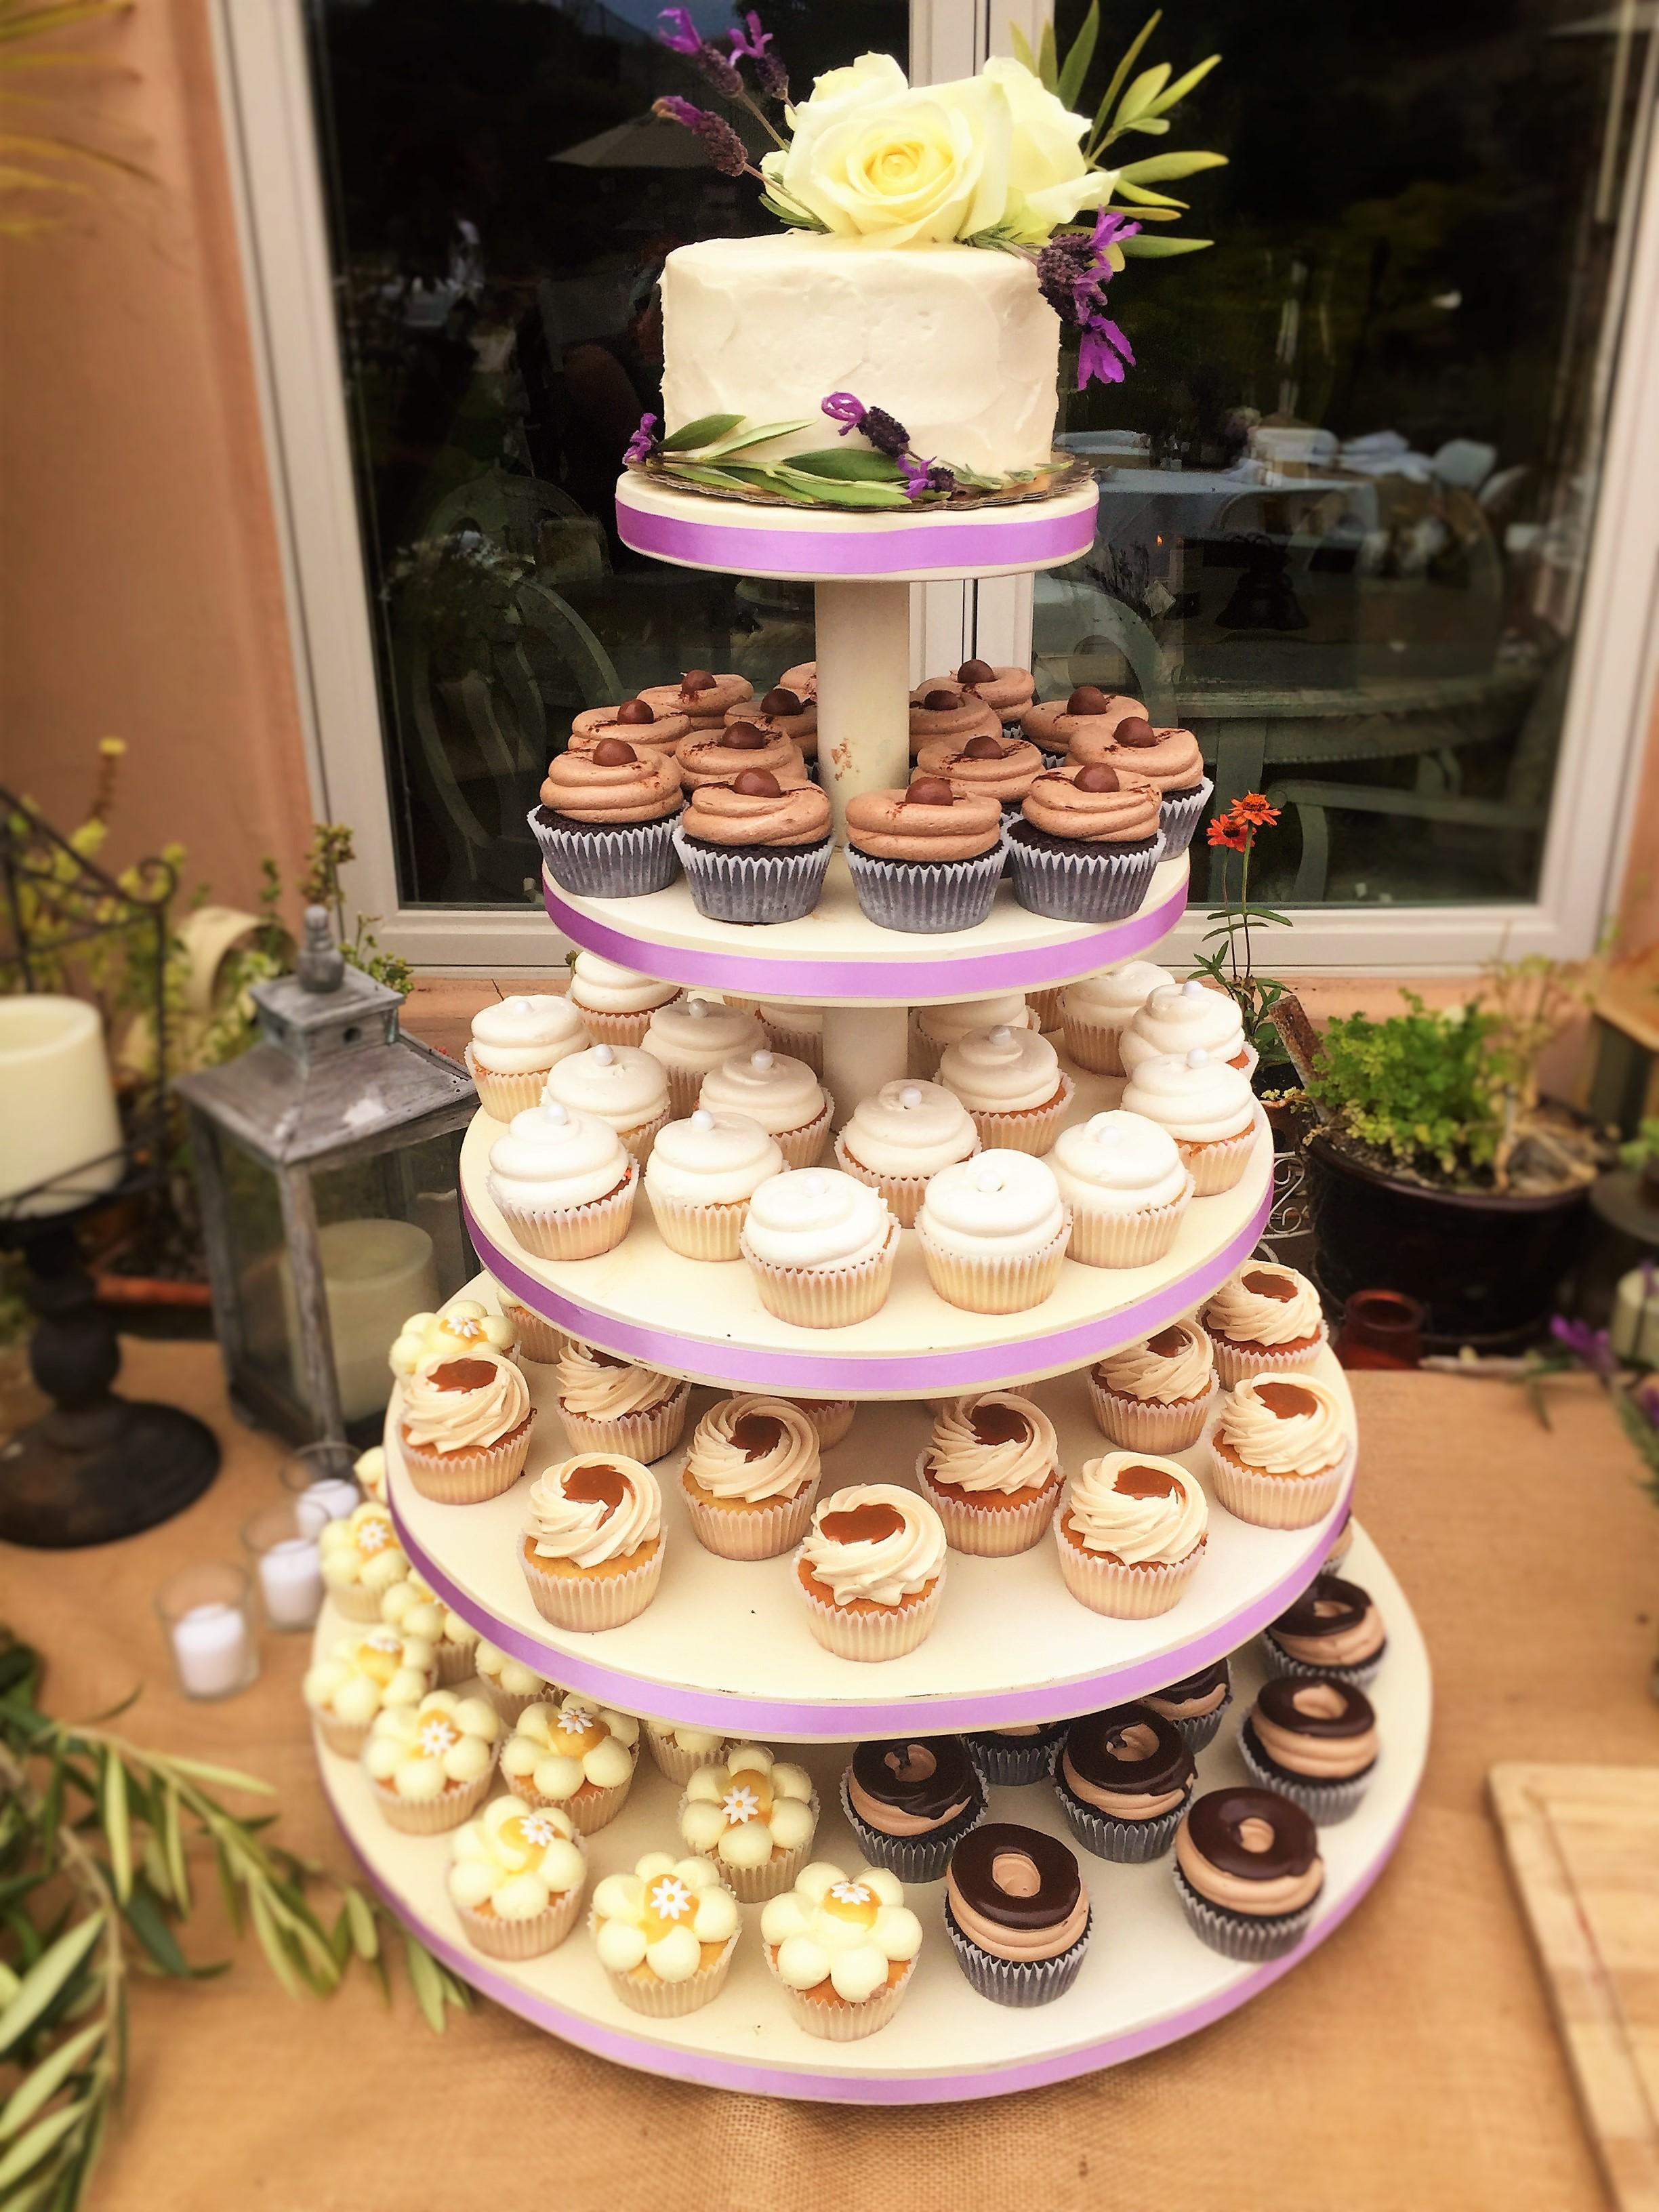 "100 cupcakes, 6"" stucco cutting cake"